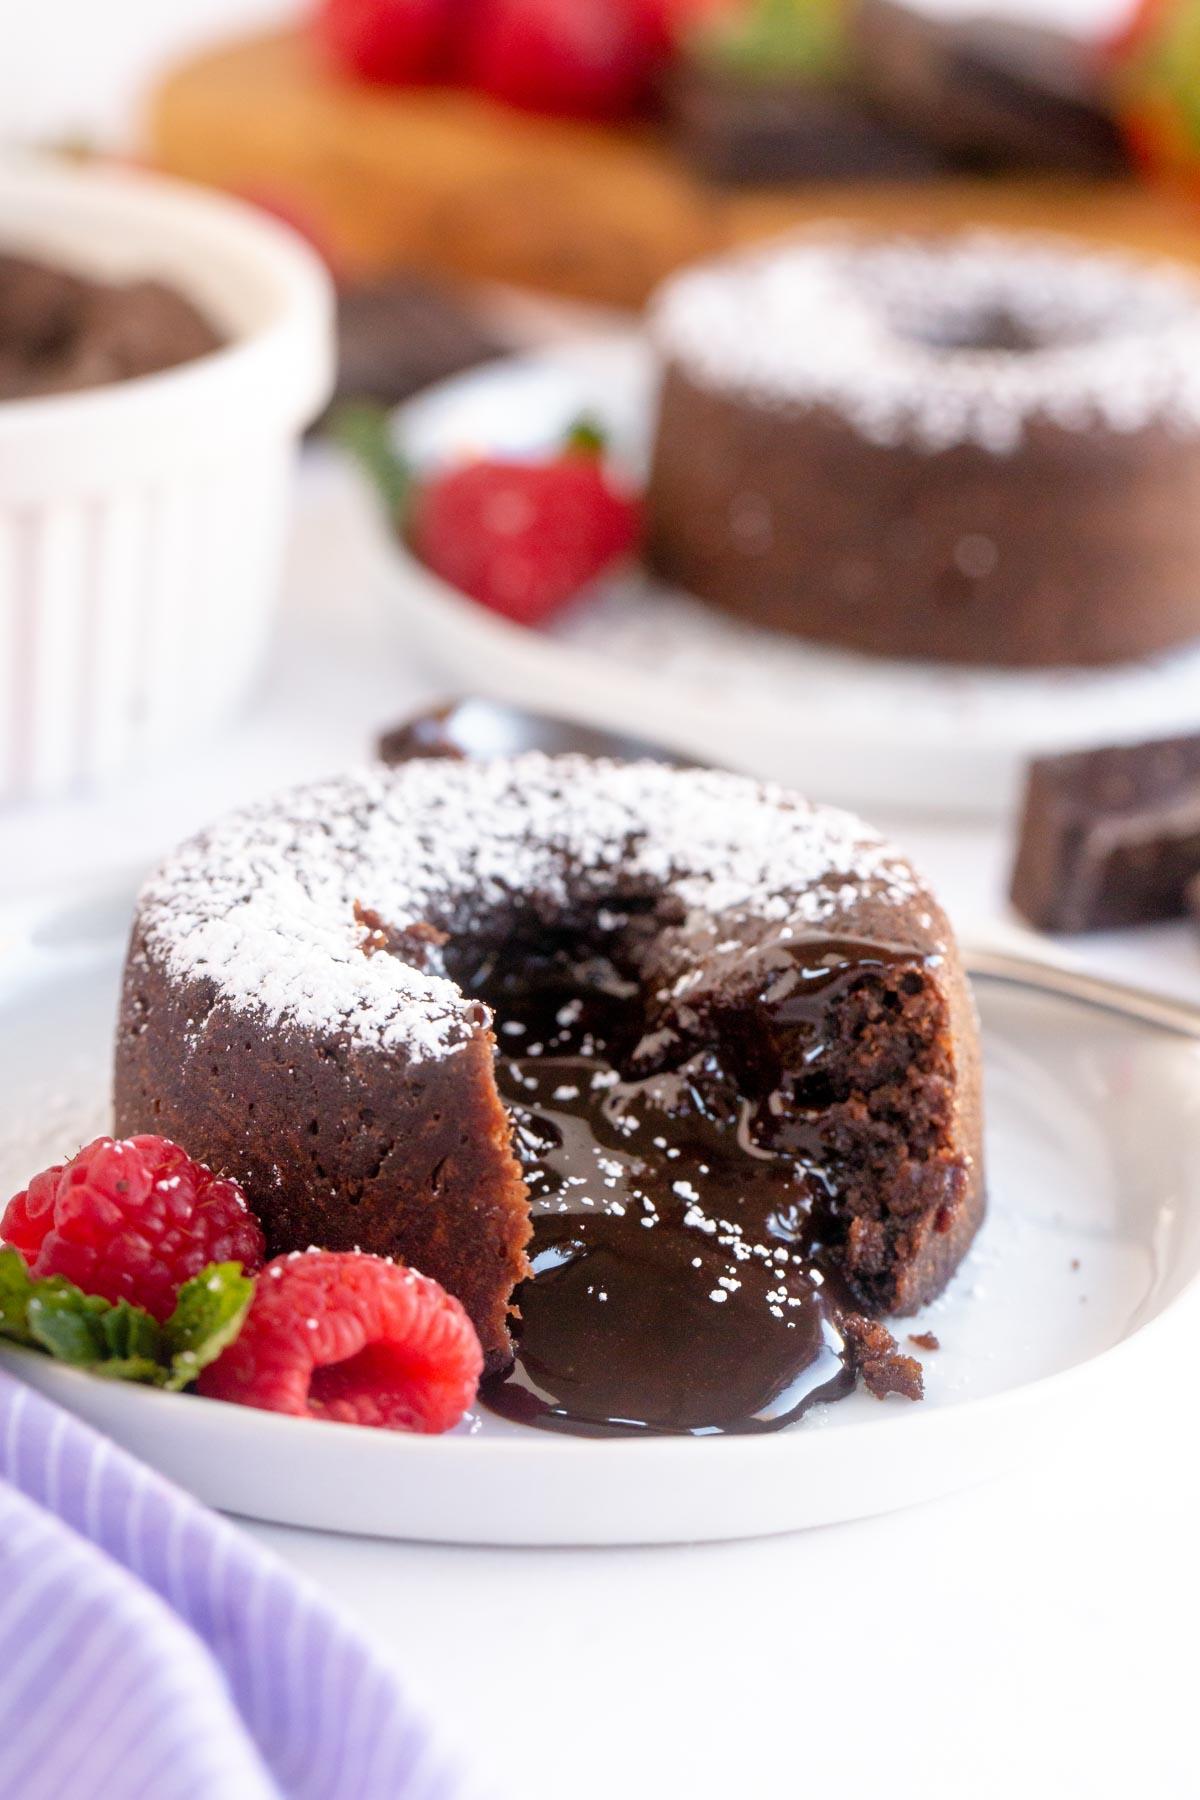 Chocolate lava cake on a white plate